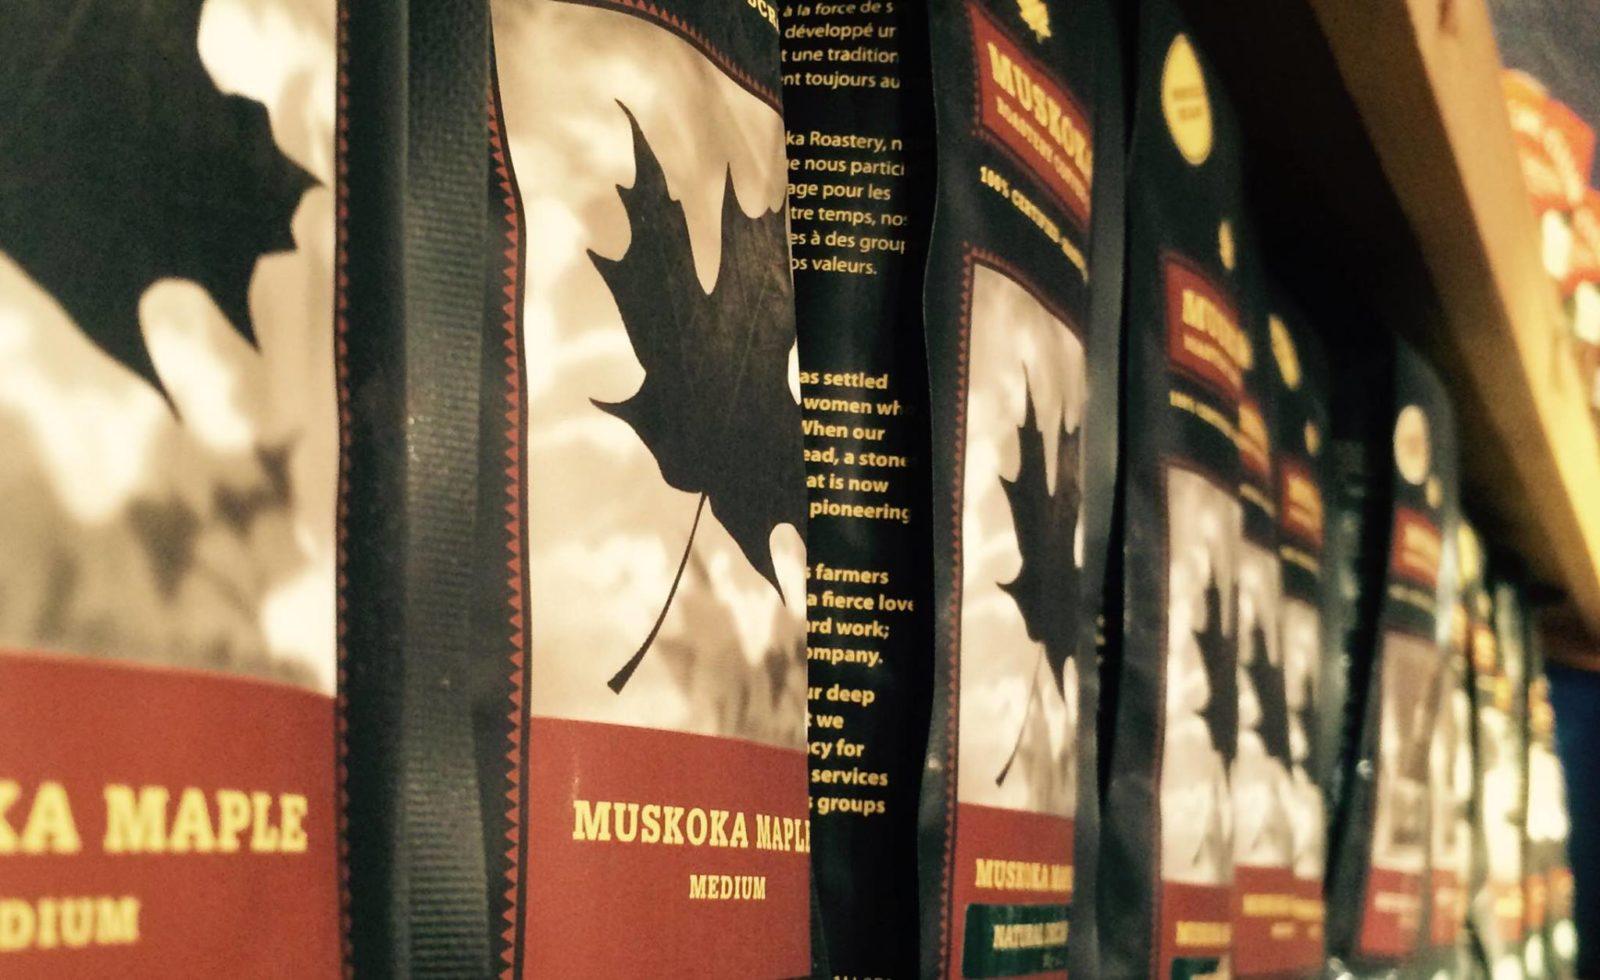 Muskoka Coffee Roasters provide coffee to some of the best coffee shops in Huntsville, seen here on a shelf